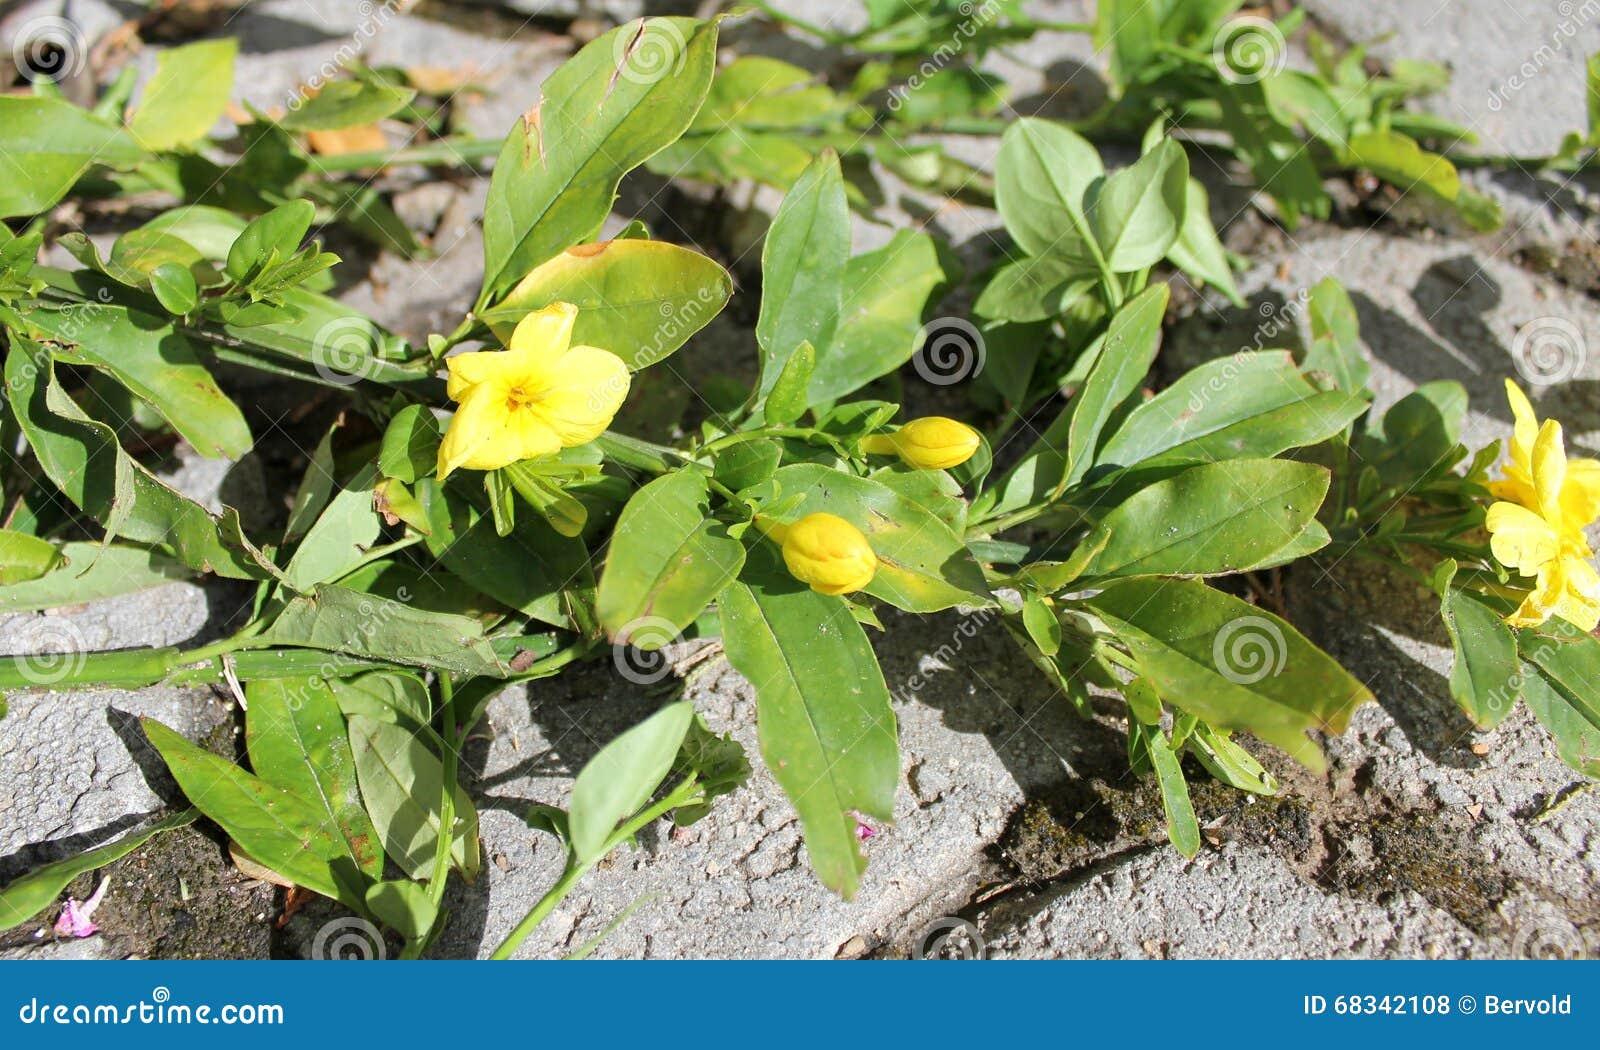 Yellow jasmine gelsemium sempervirens flowers stock photo image of yellow jasmine gelsemium sempervirens flowers recreation plant izmirmasajfo Images